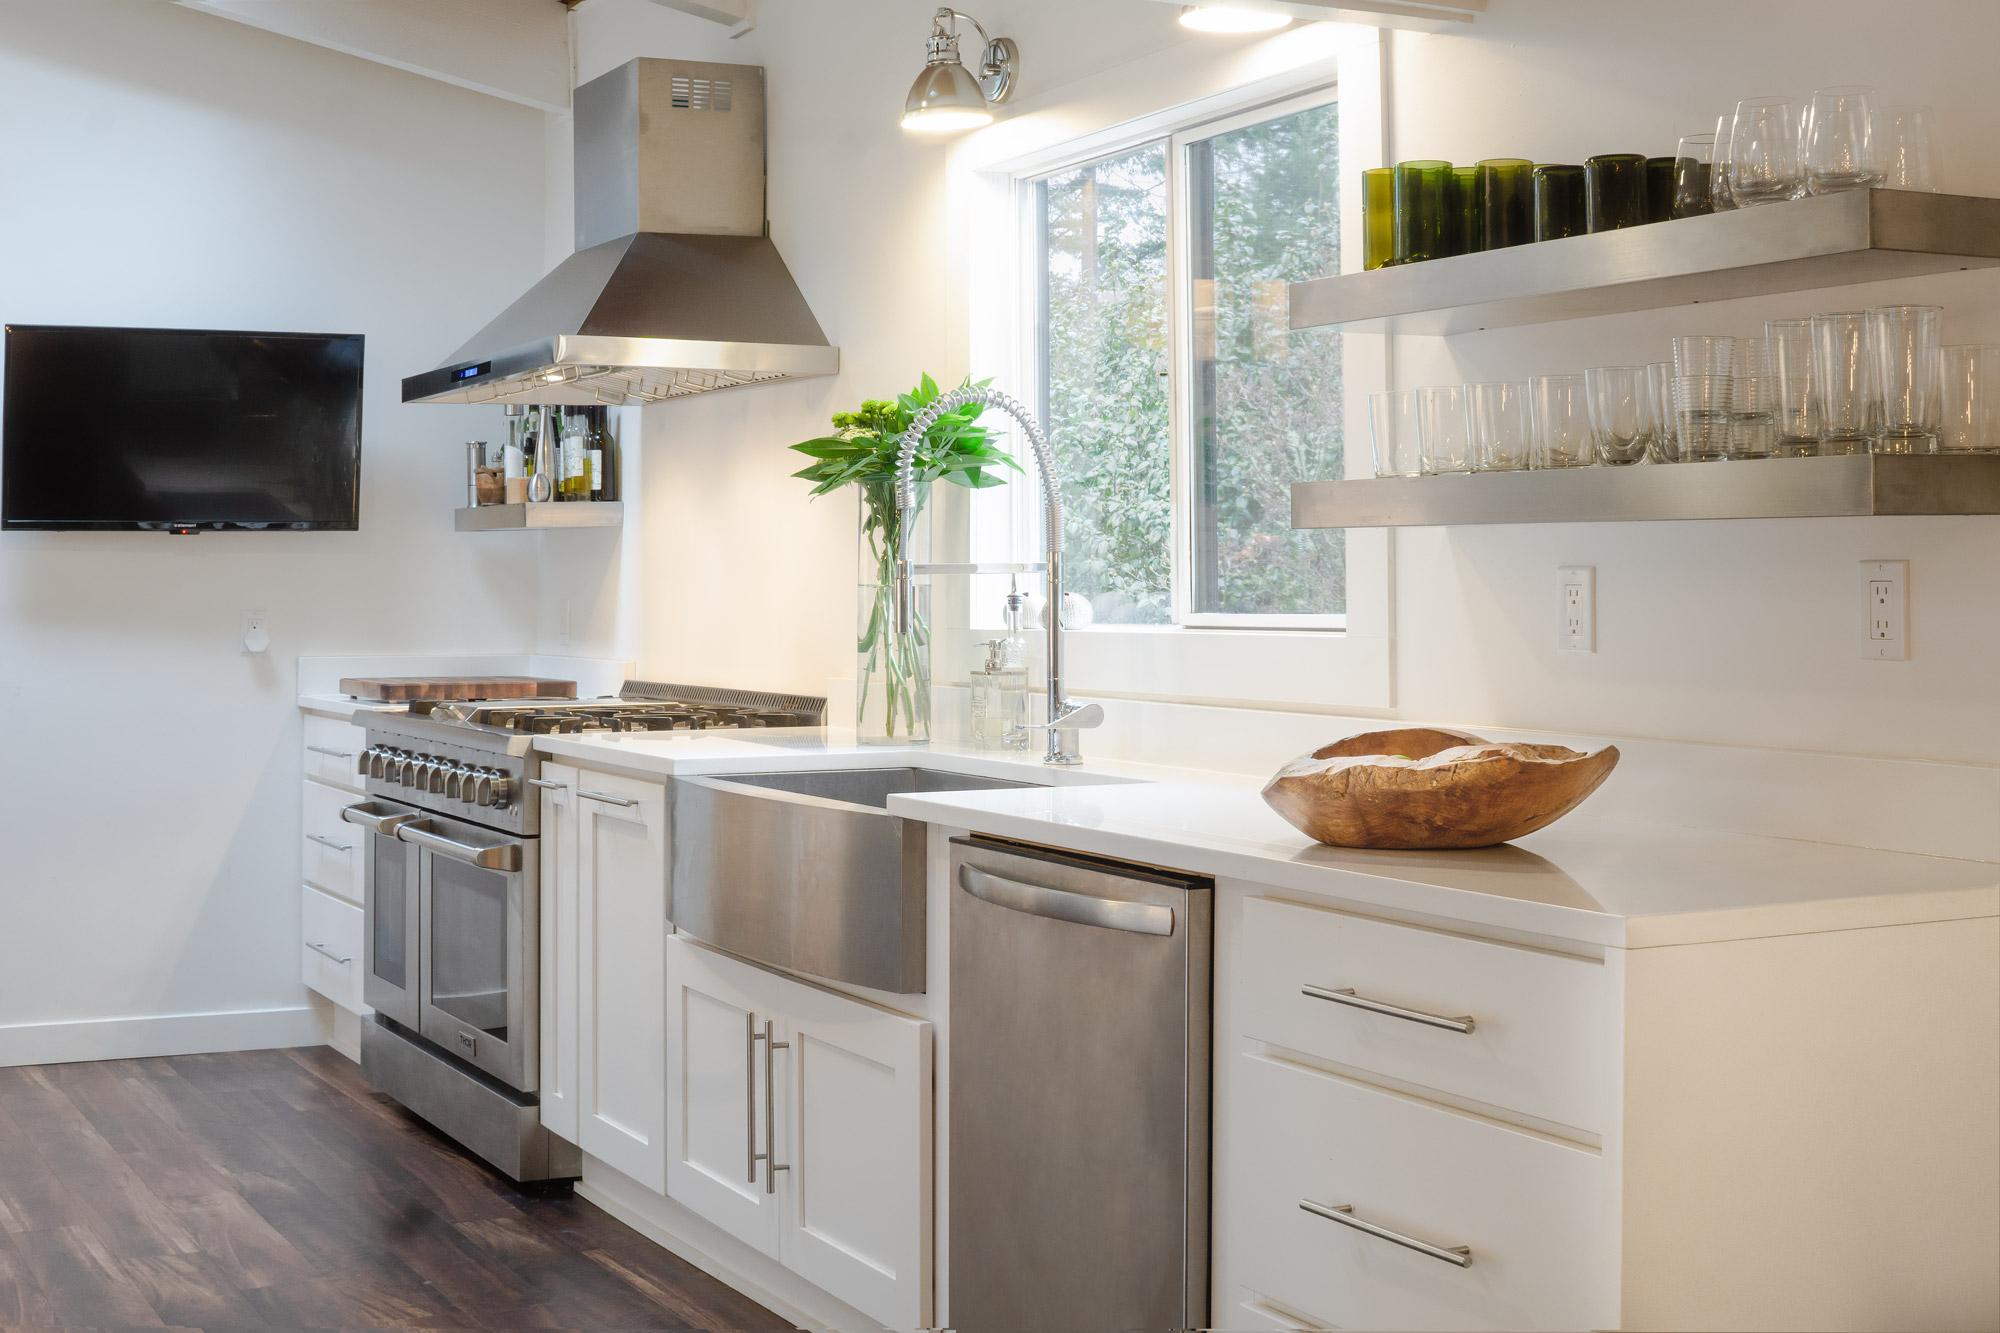 Phare-kitchen-sink-overview-web.jpg